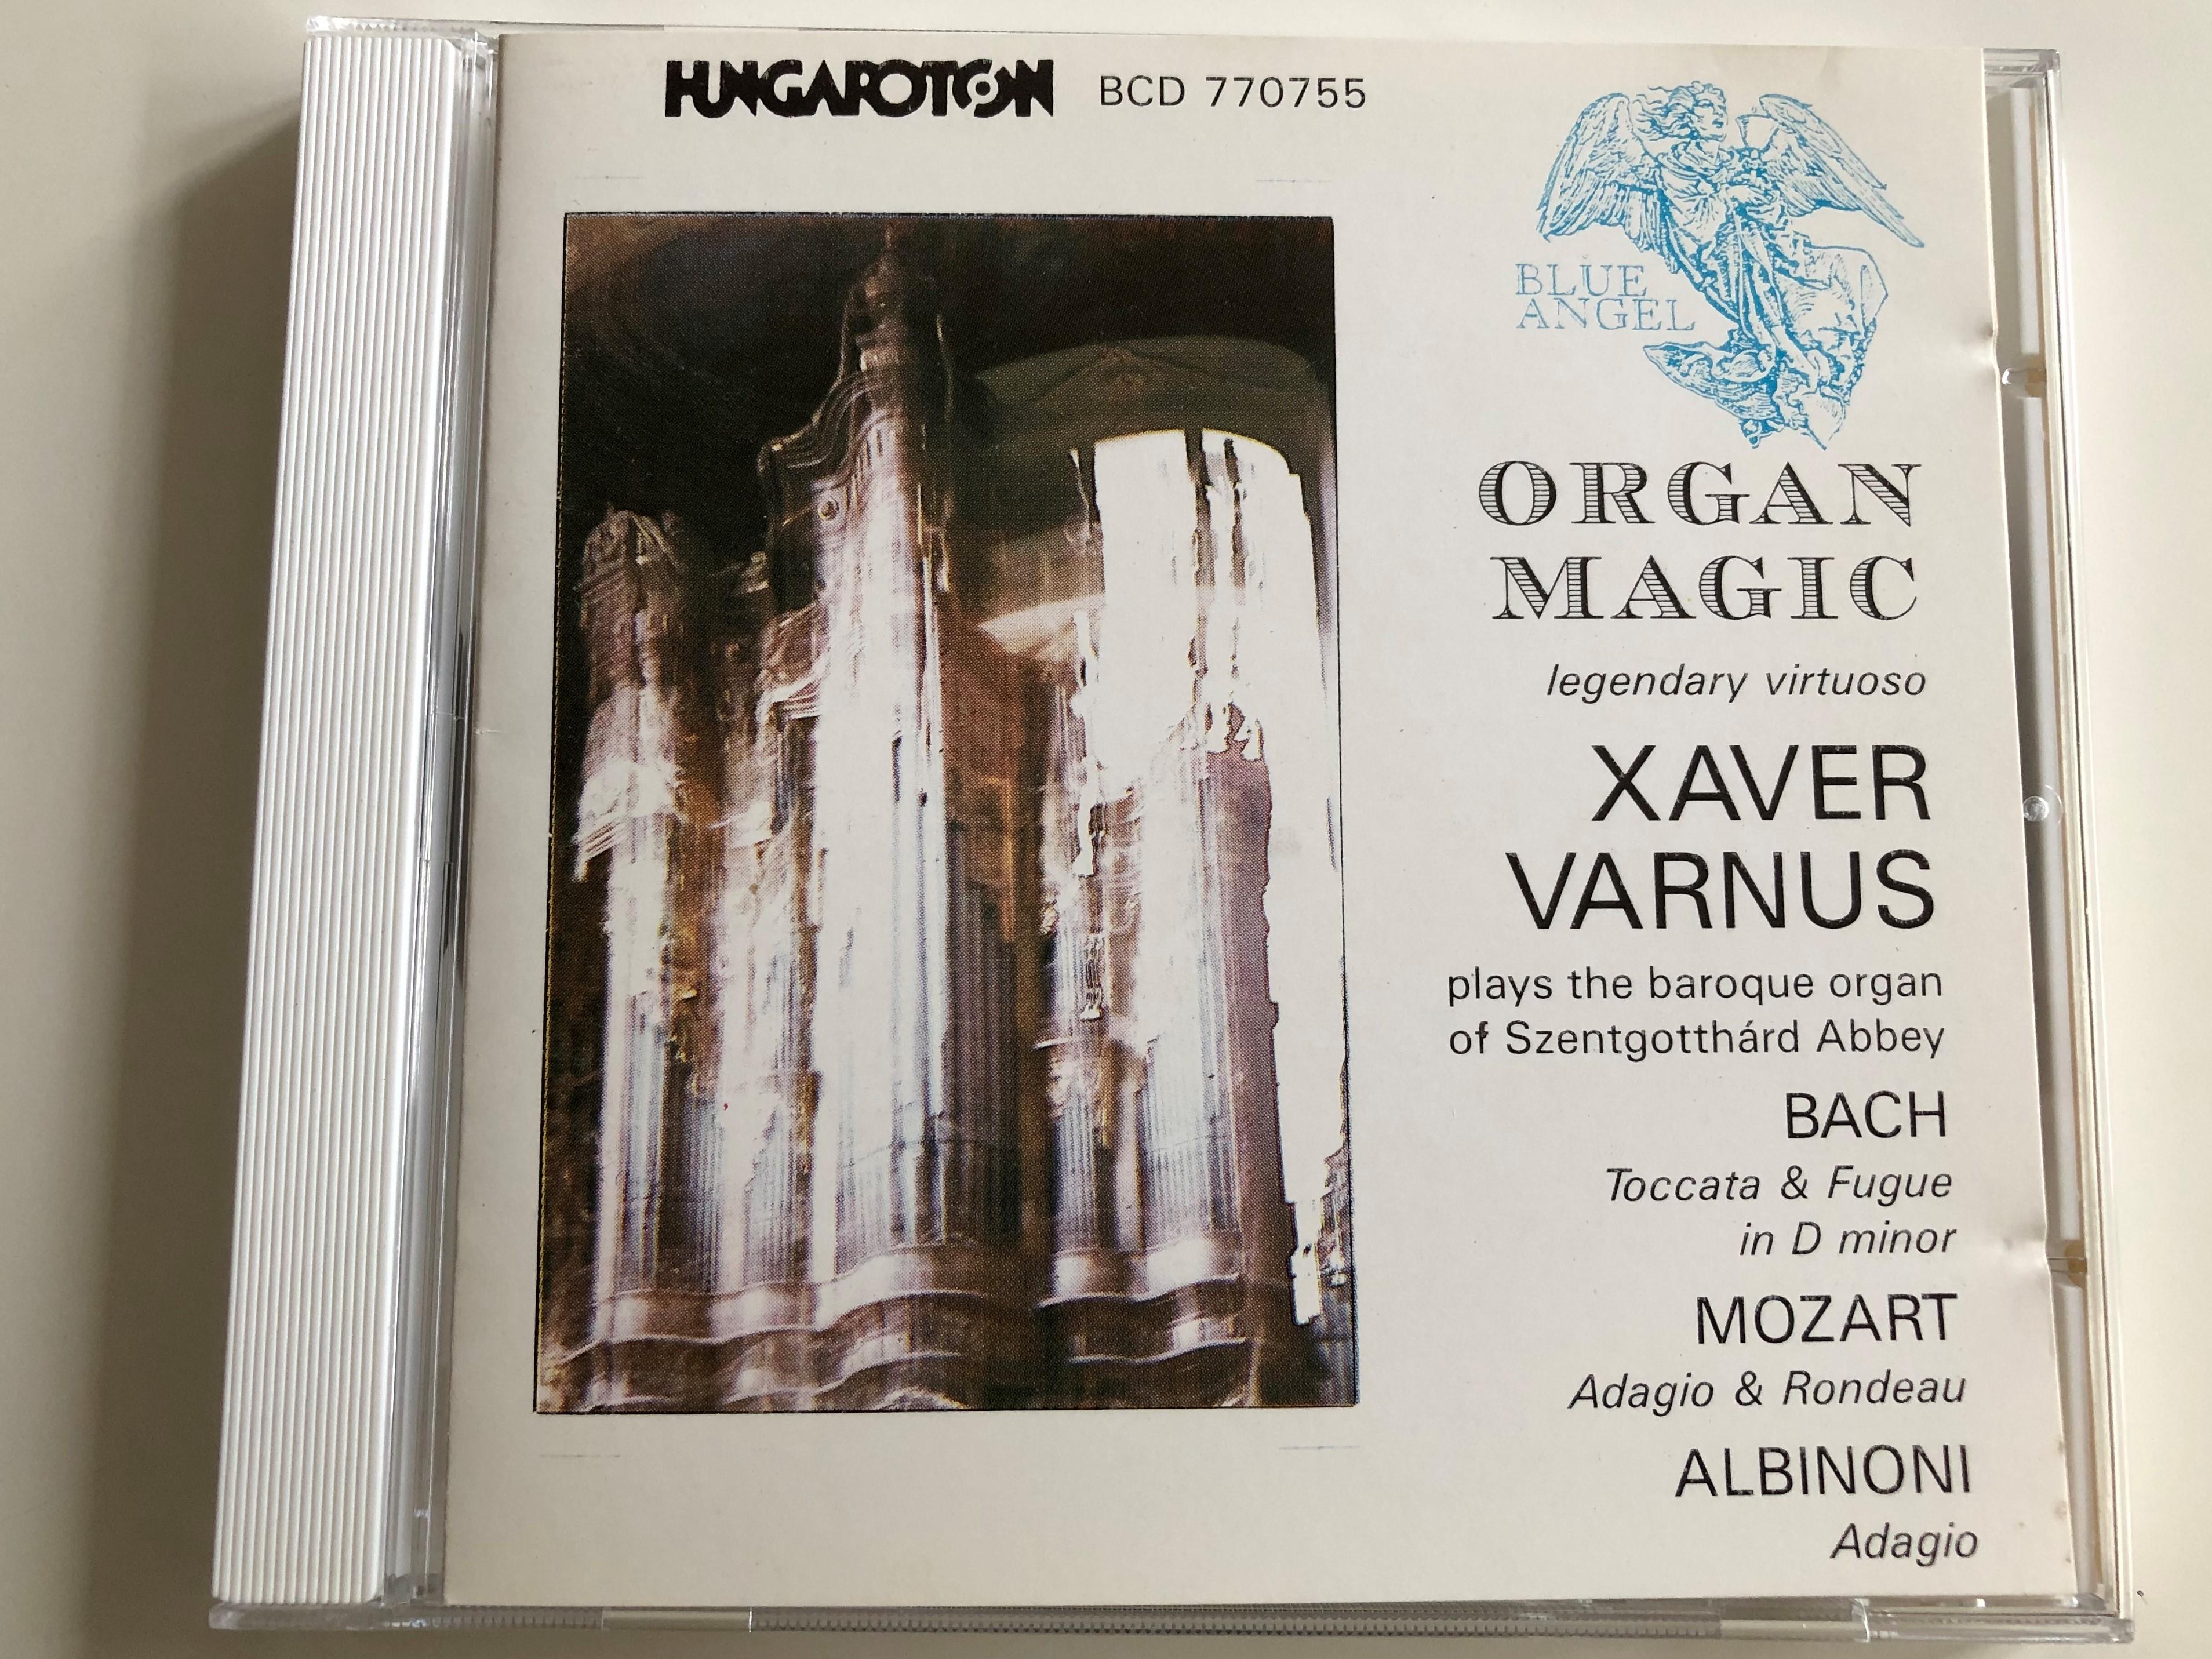 organ-magic-legendary-virtuoso-xaver-varnus-plays-the-baroque-organ-of-szentgotth-rd-abbey-bach-toccata-fugue-in-d-minor-mozart-adagio-rondeau-albinoni-adagio-hungaroton-bcd-770755-audio-cd-1992-1-.jpg